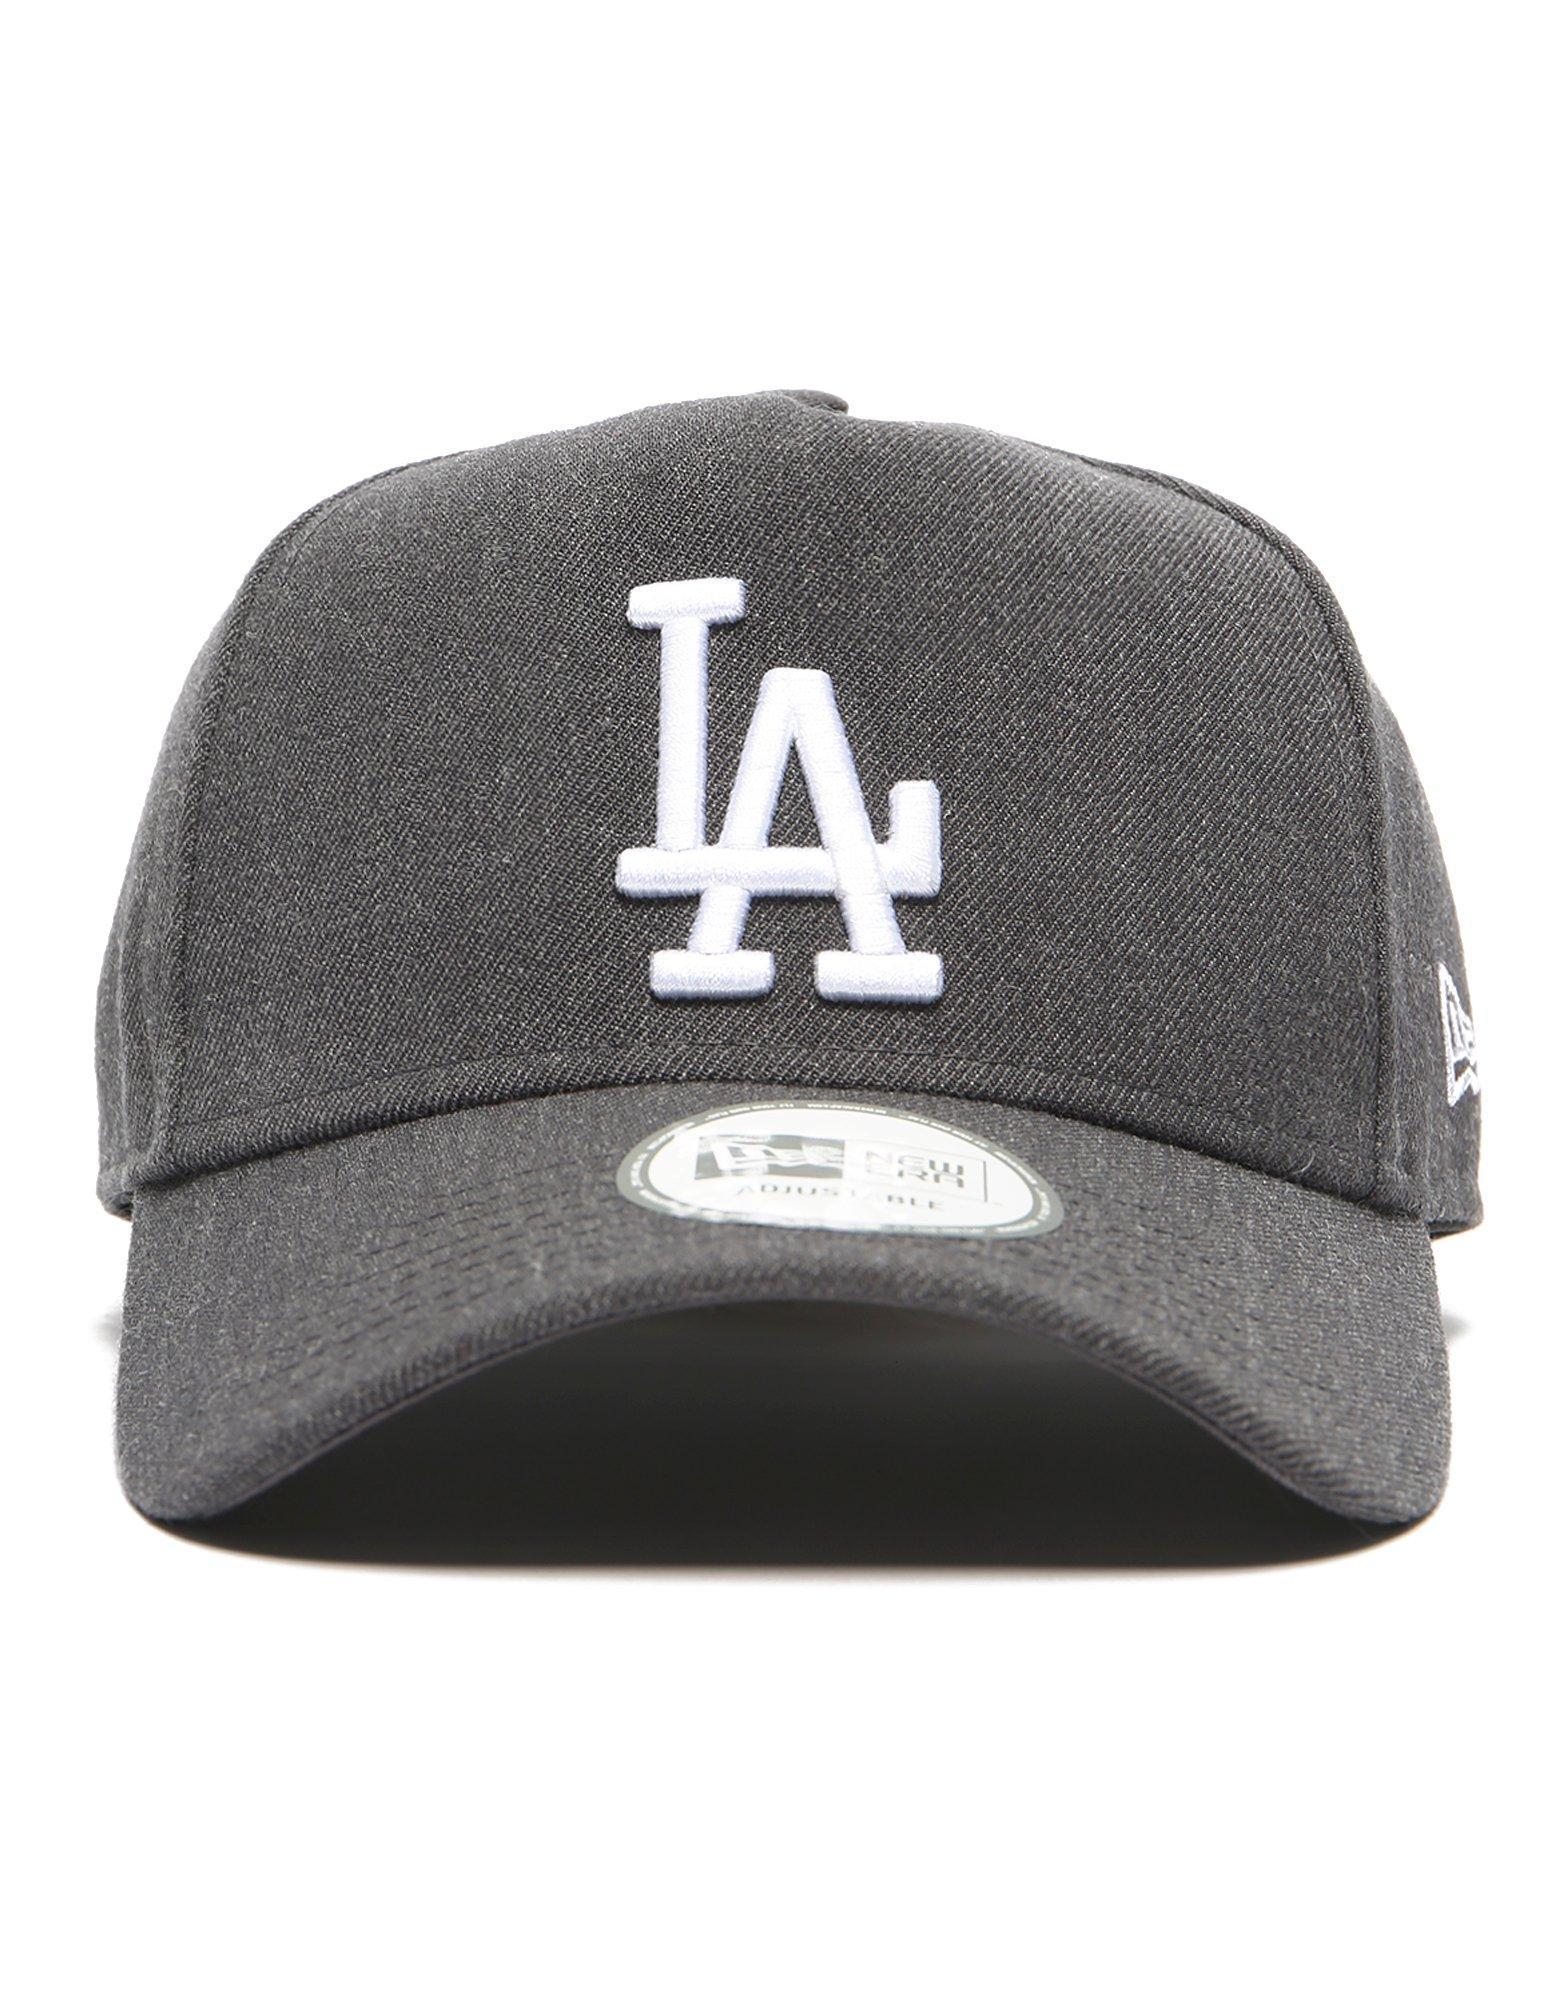 cf08b862133 Ktz Mlb Los Angeles Dodgers Cap in Gray for Men - Lyst